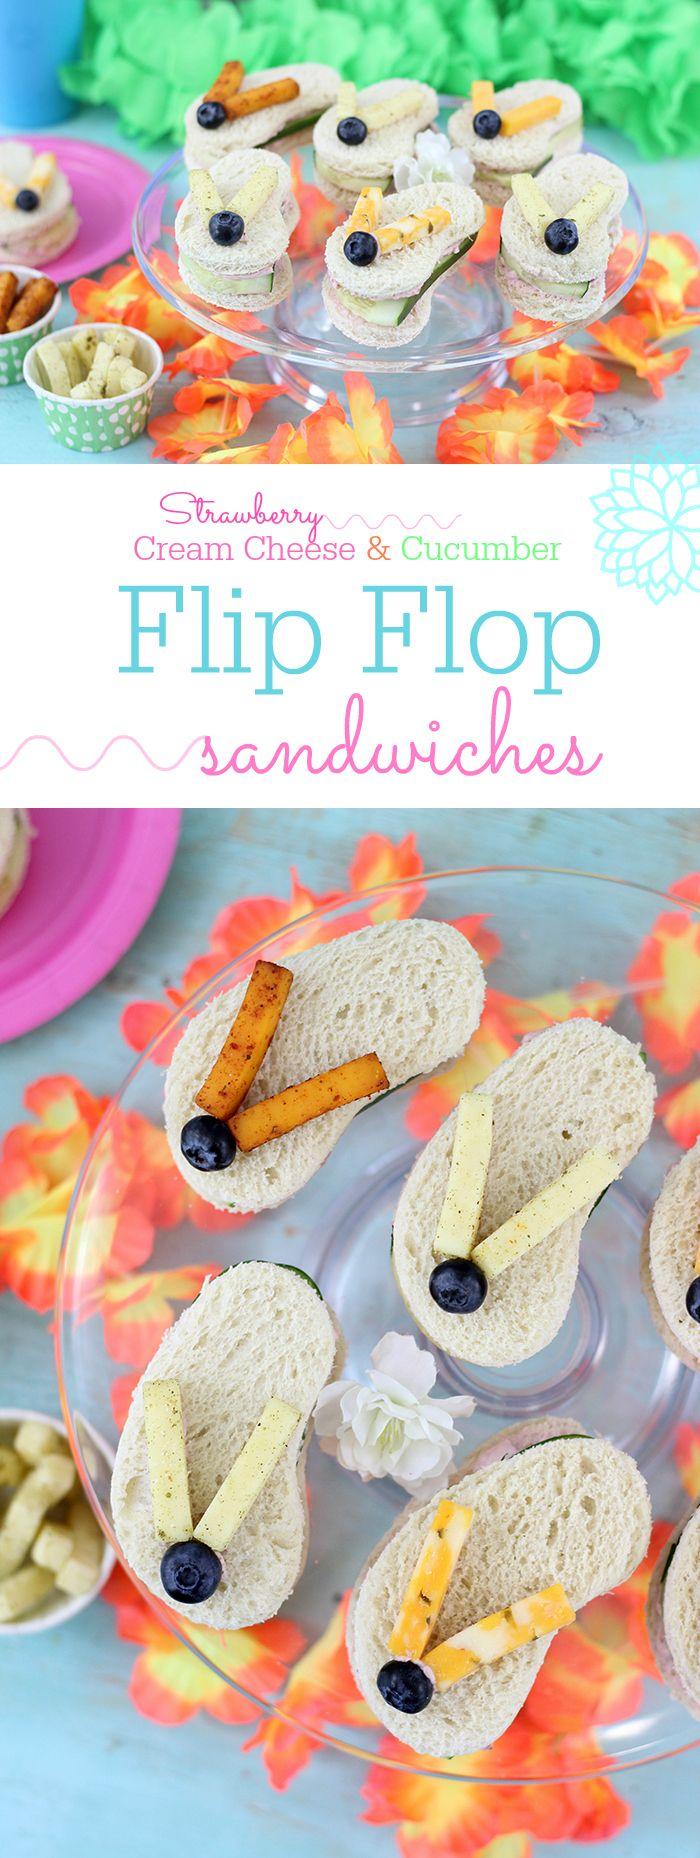 Best 20+ Kids party sandwiches ideas on Pinterest | Butterfly food ...